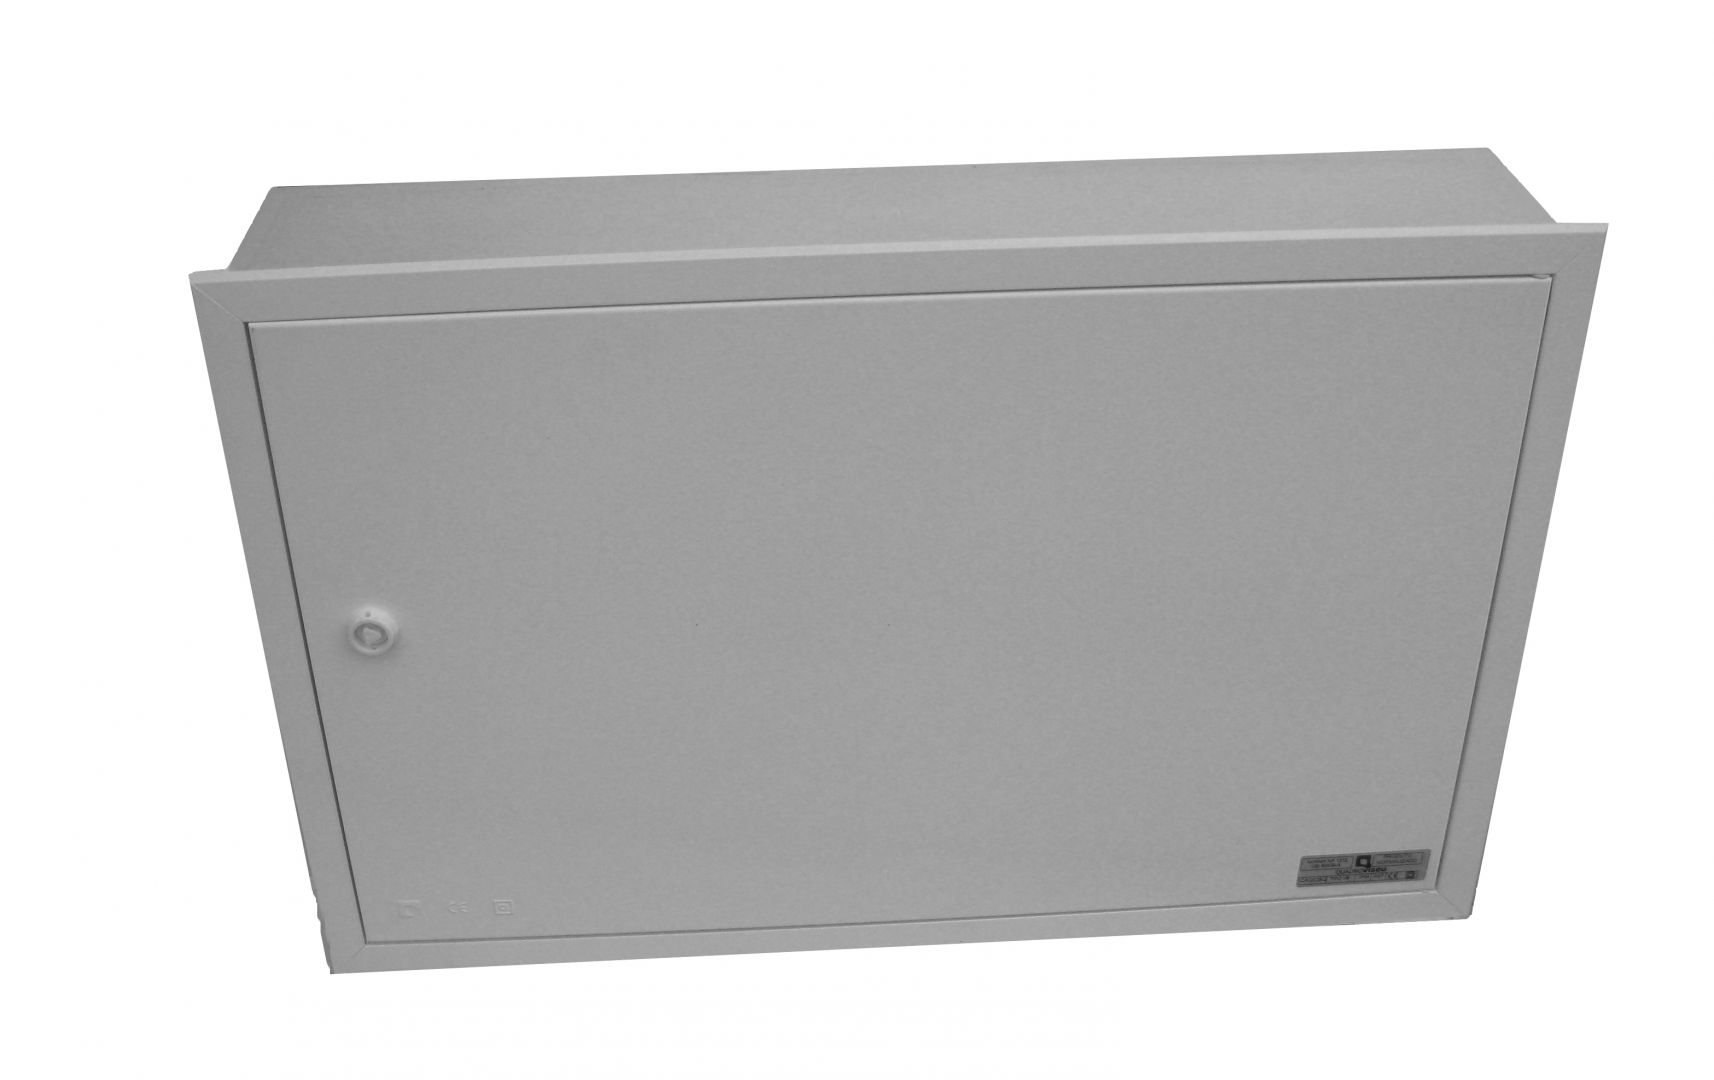 ENVELOPE VISBOX VIDE A ENCASTRER AVEC PORTE 320X250X130